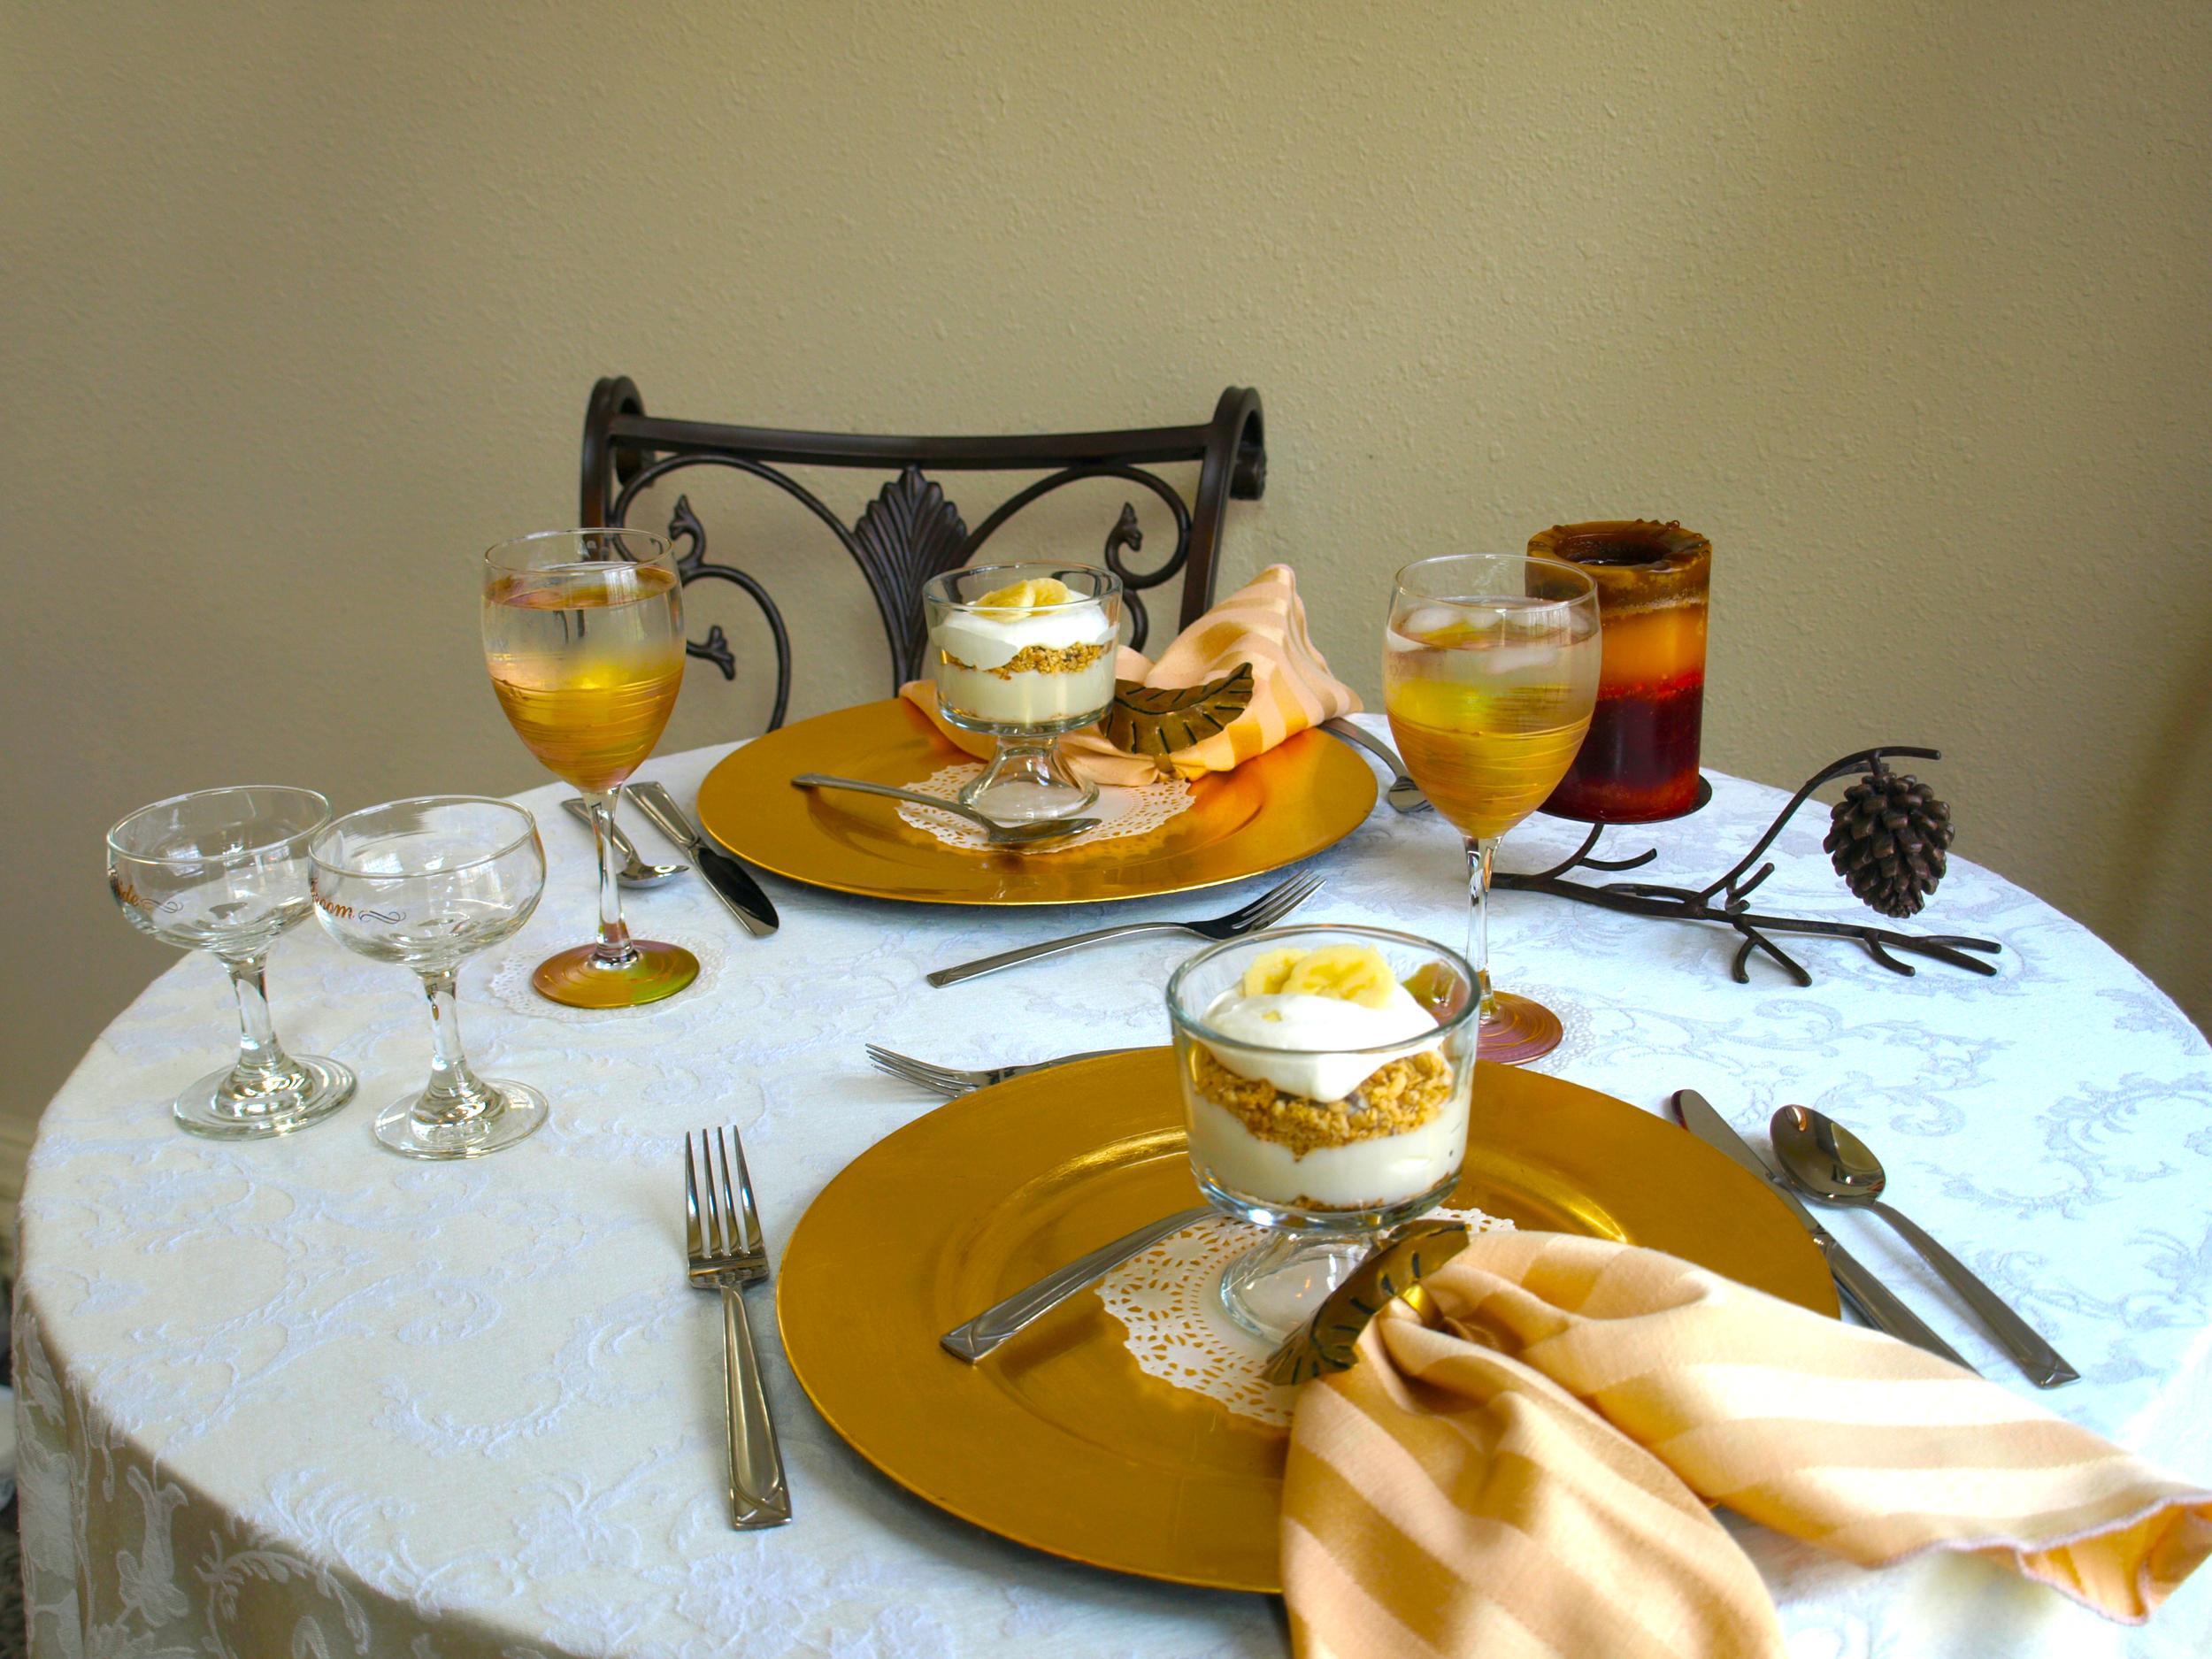 table-setting-3-2.jpg